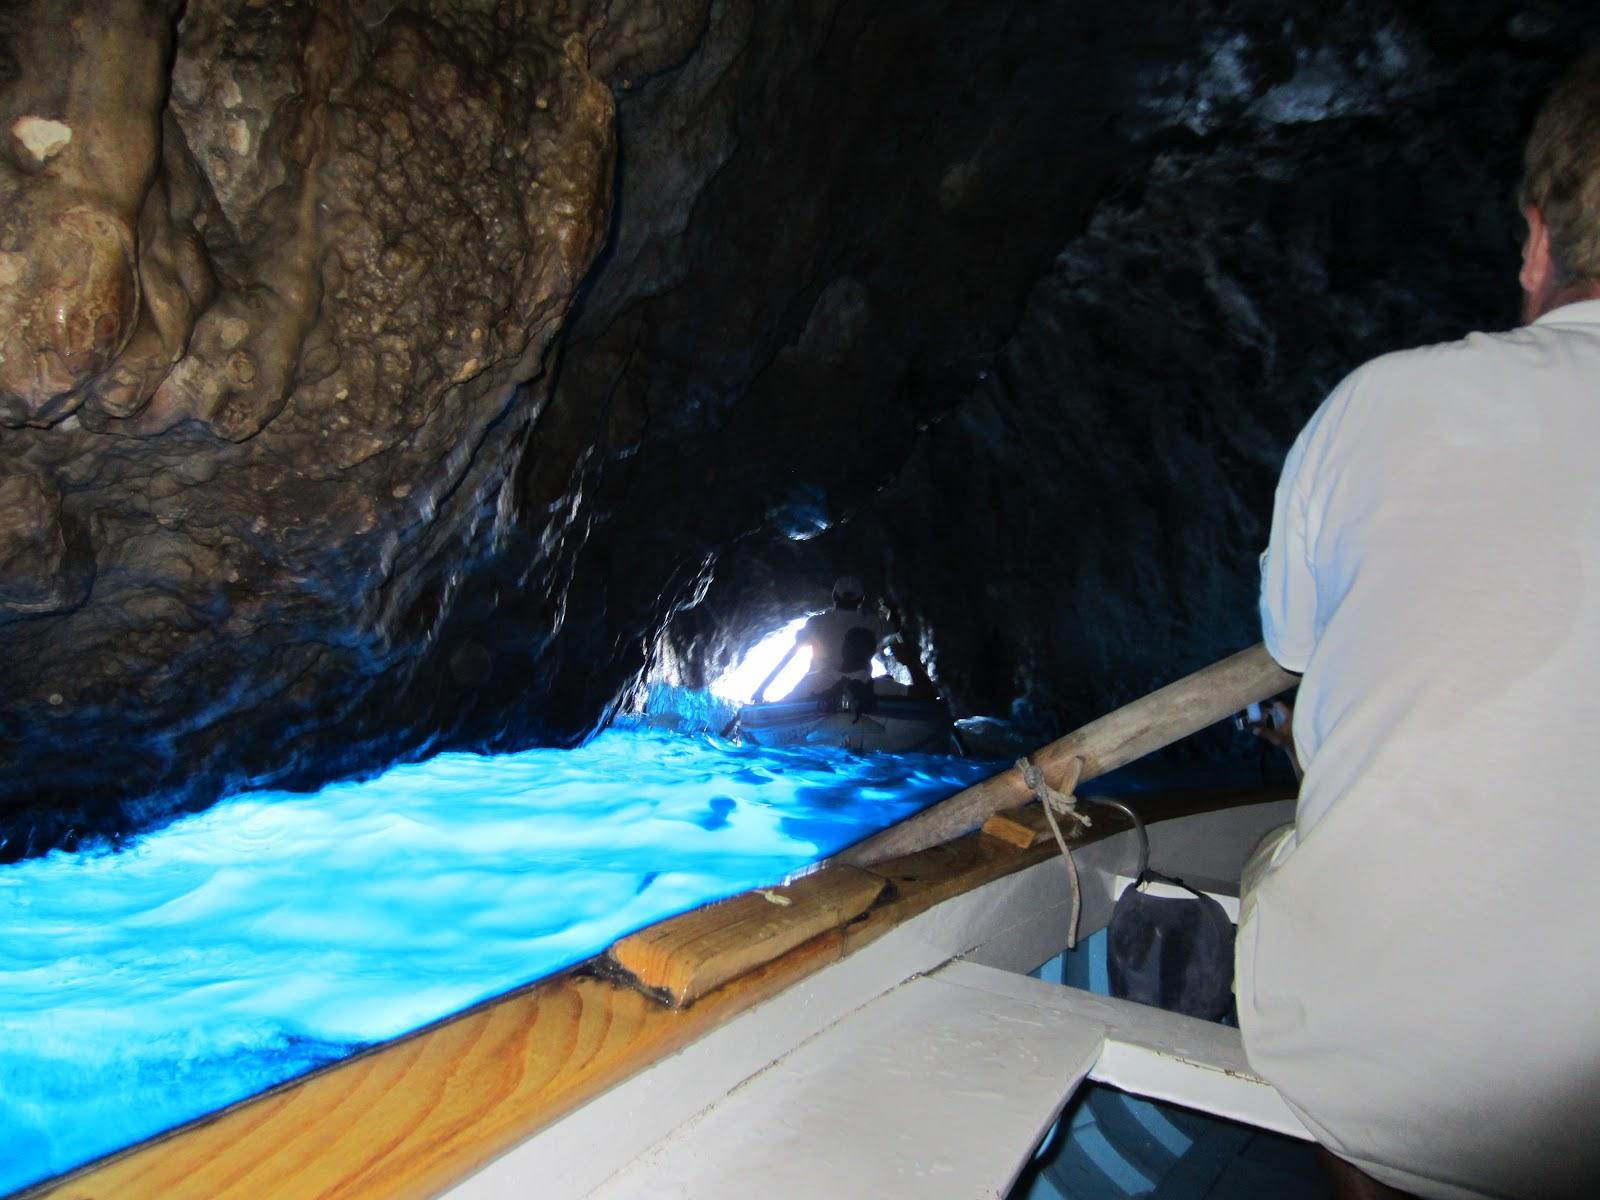 Lkq Blue Island >> Vintage Modern: ITALY Capri | Day 2